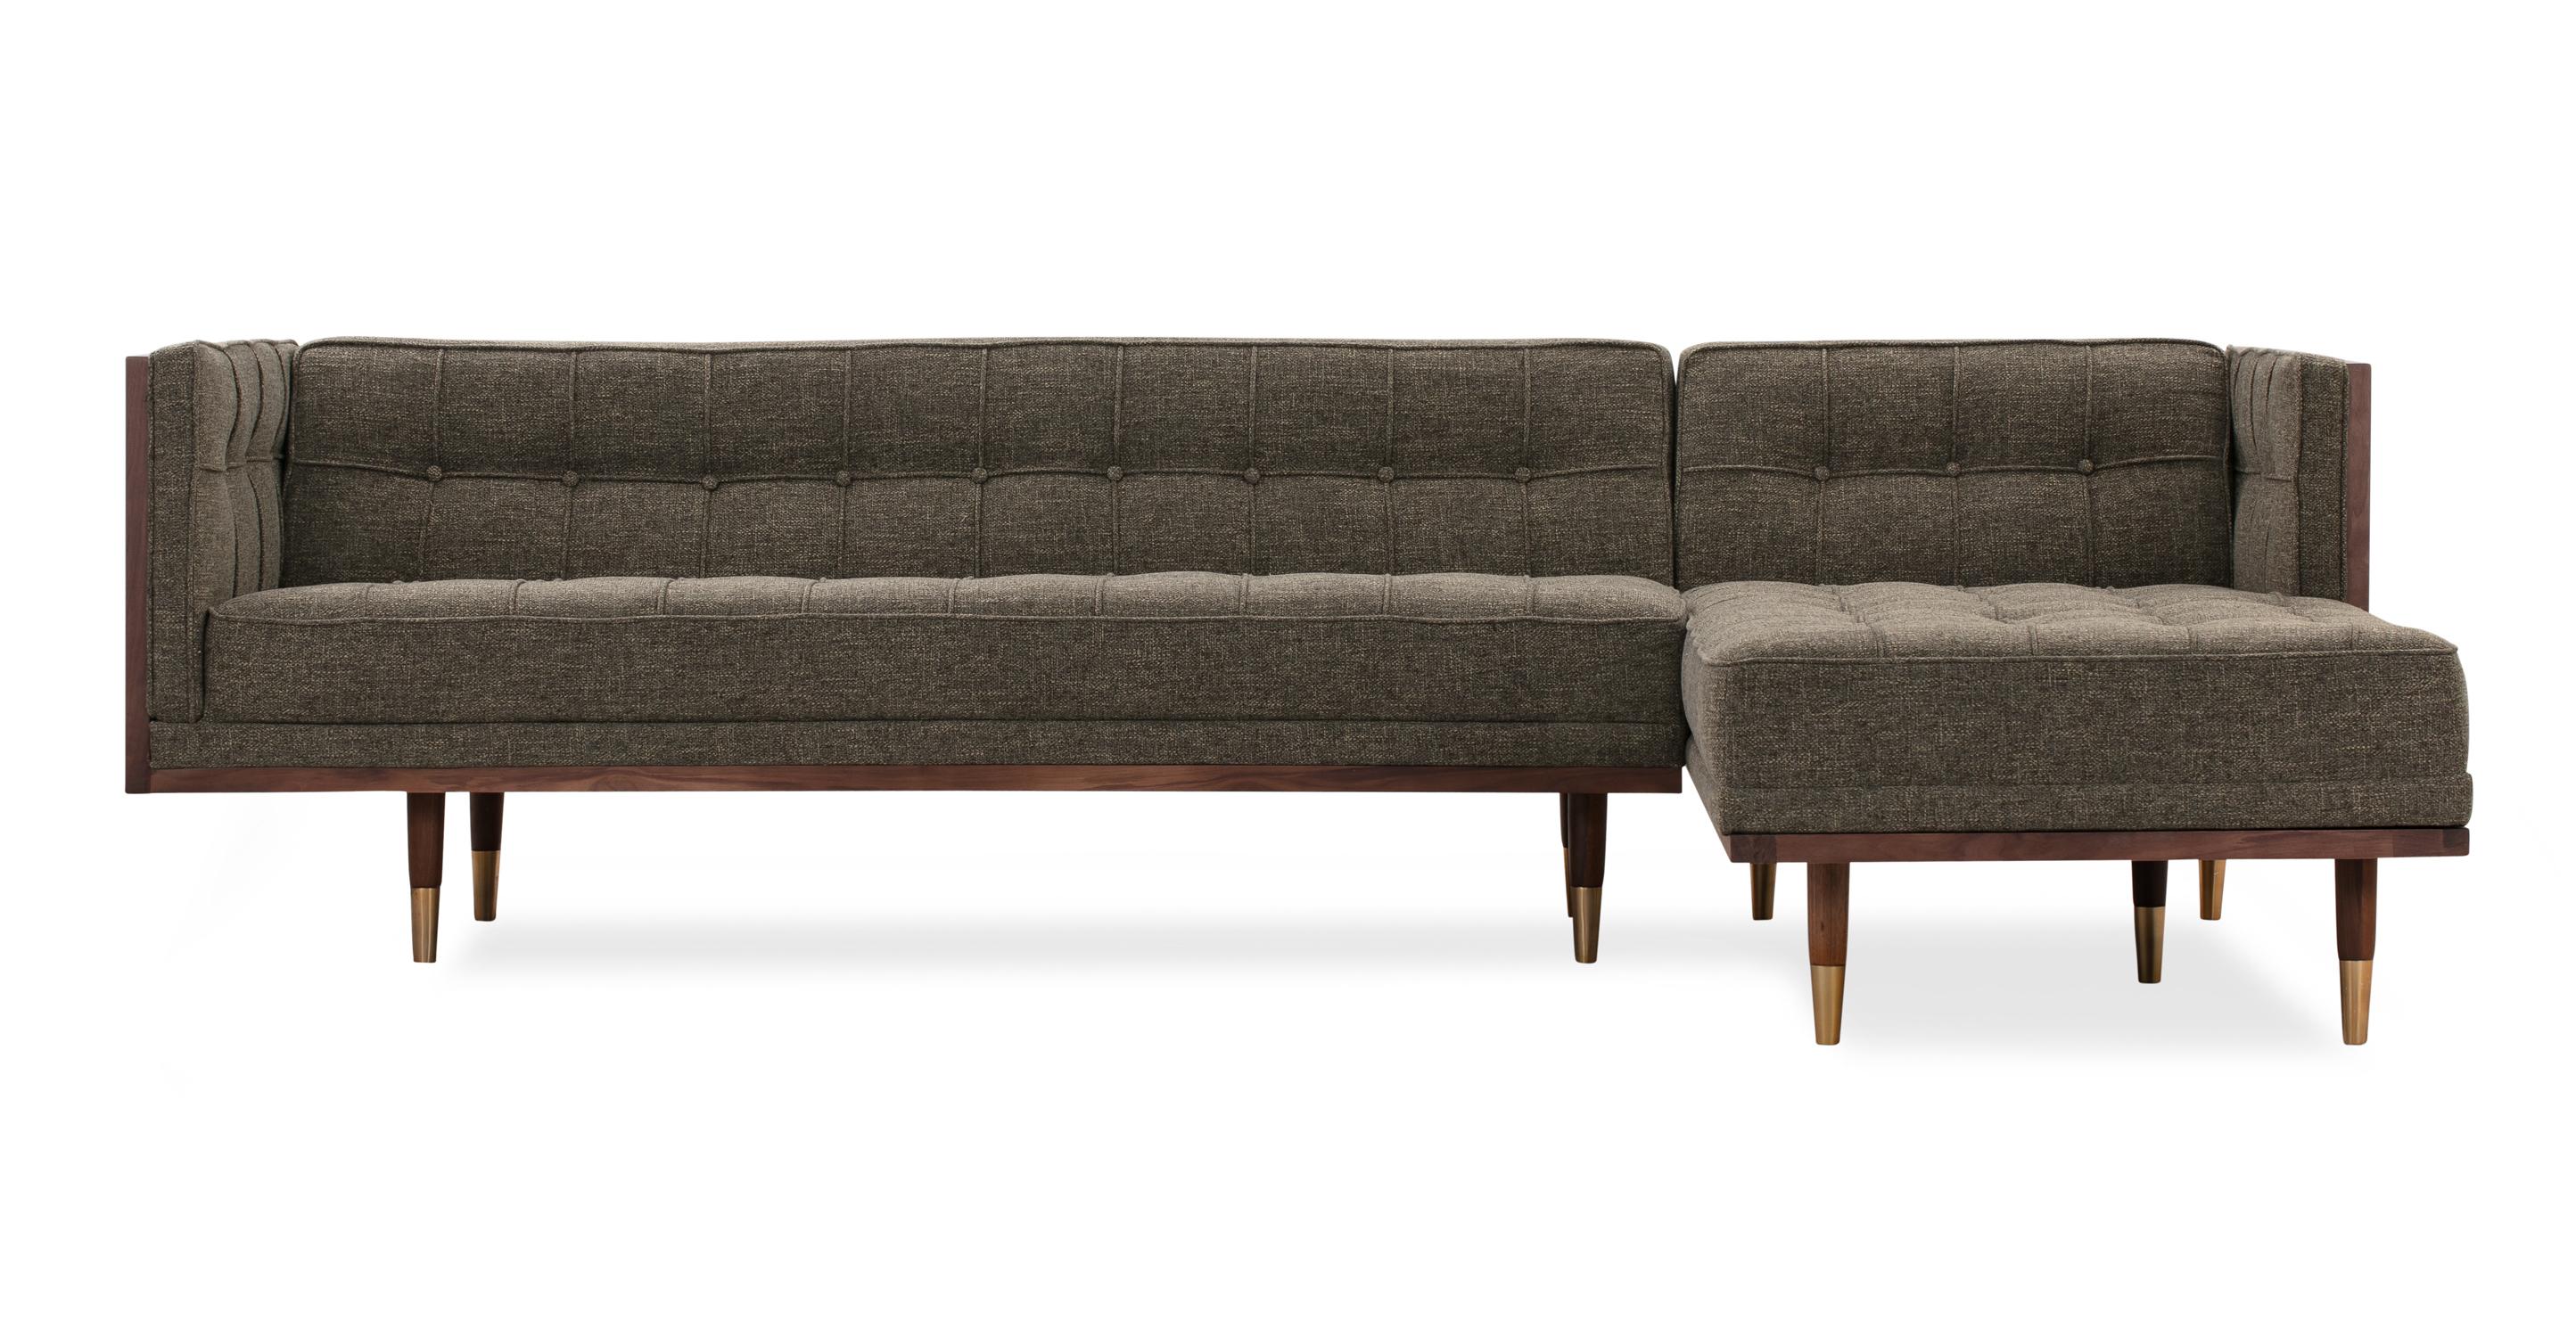 "Woodrow Box 100"" Fabric Sofa Sectional Right, Walnut/Tarragon"